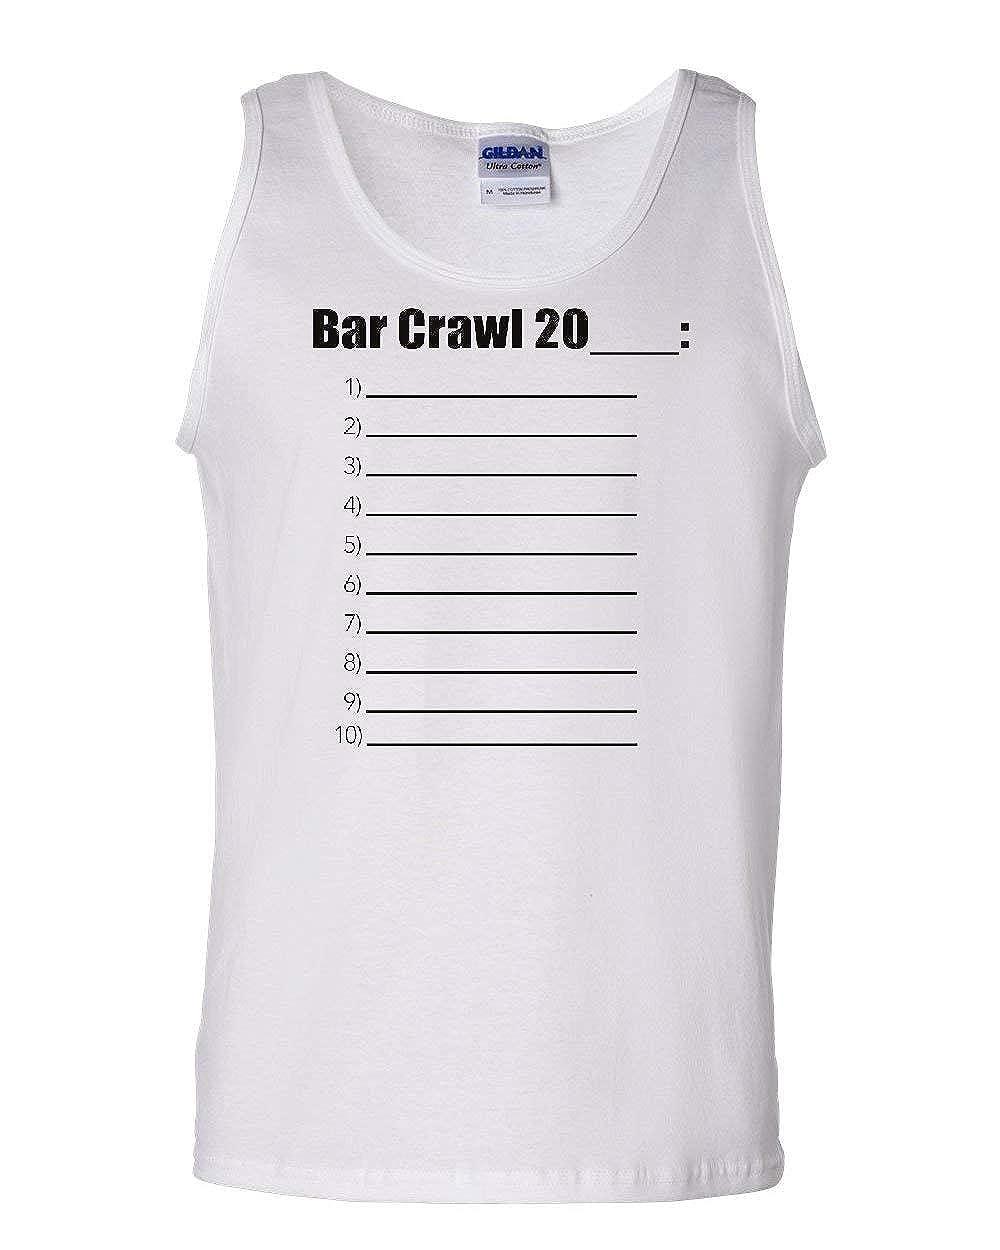 Bar Crawl 20/_ Check List Tank Top Drinking College Beer Booze Sleeveless